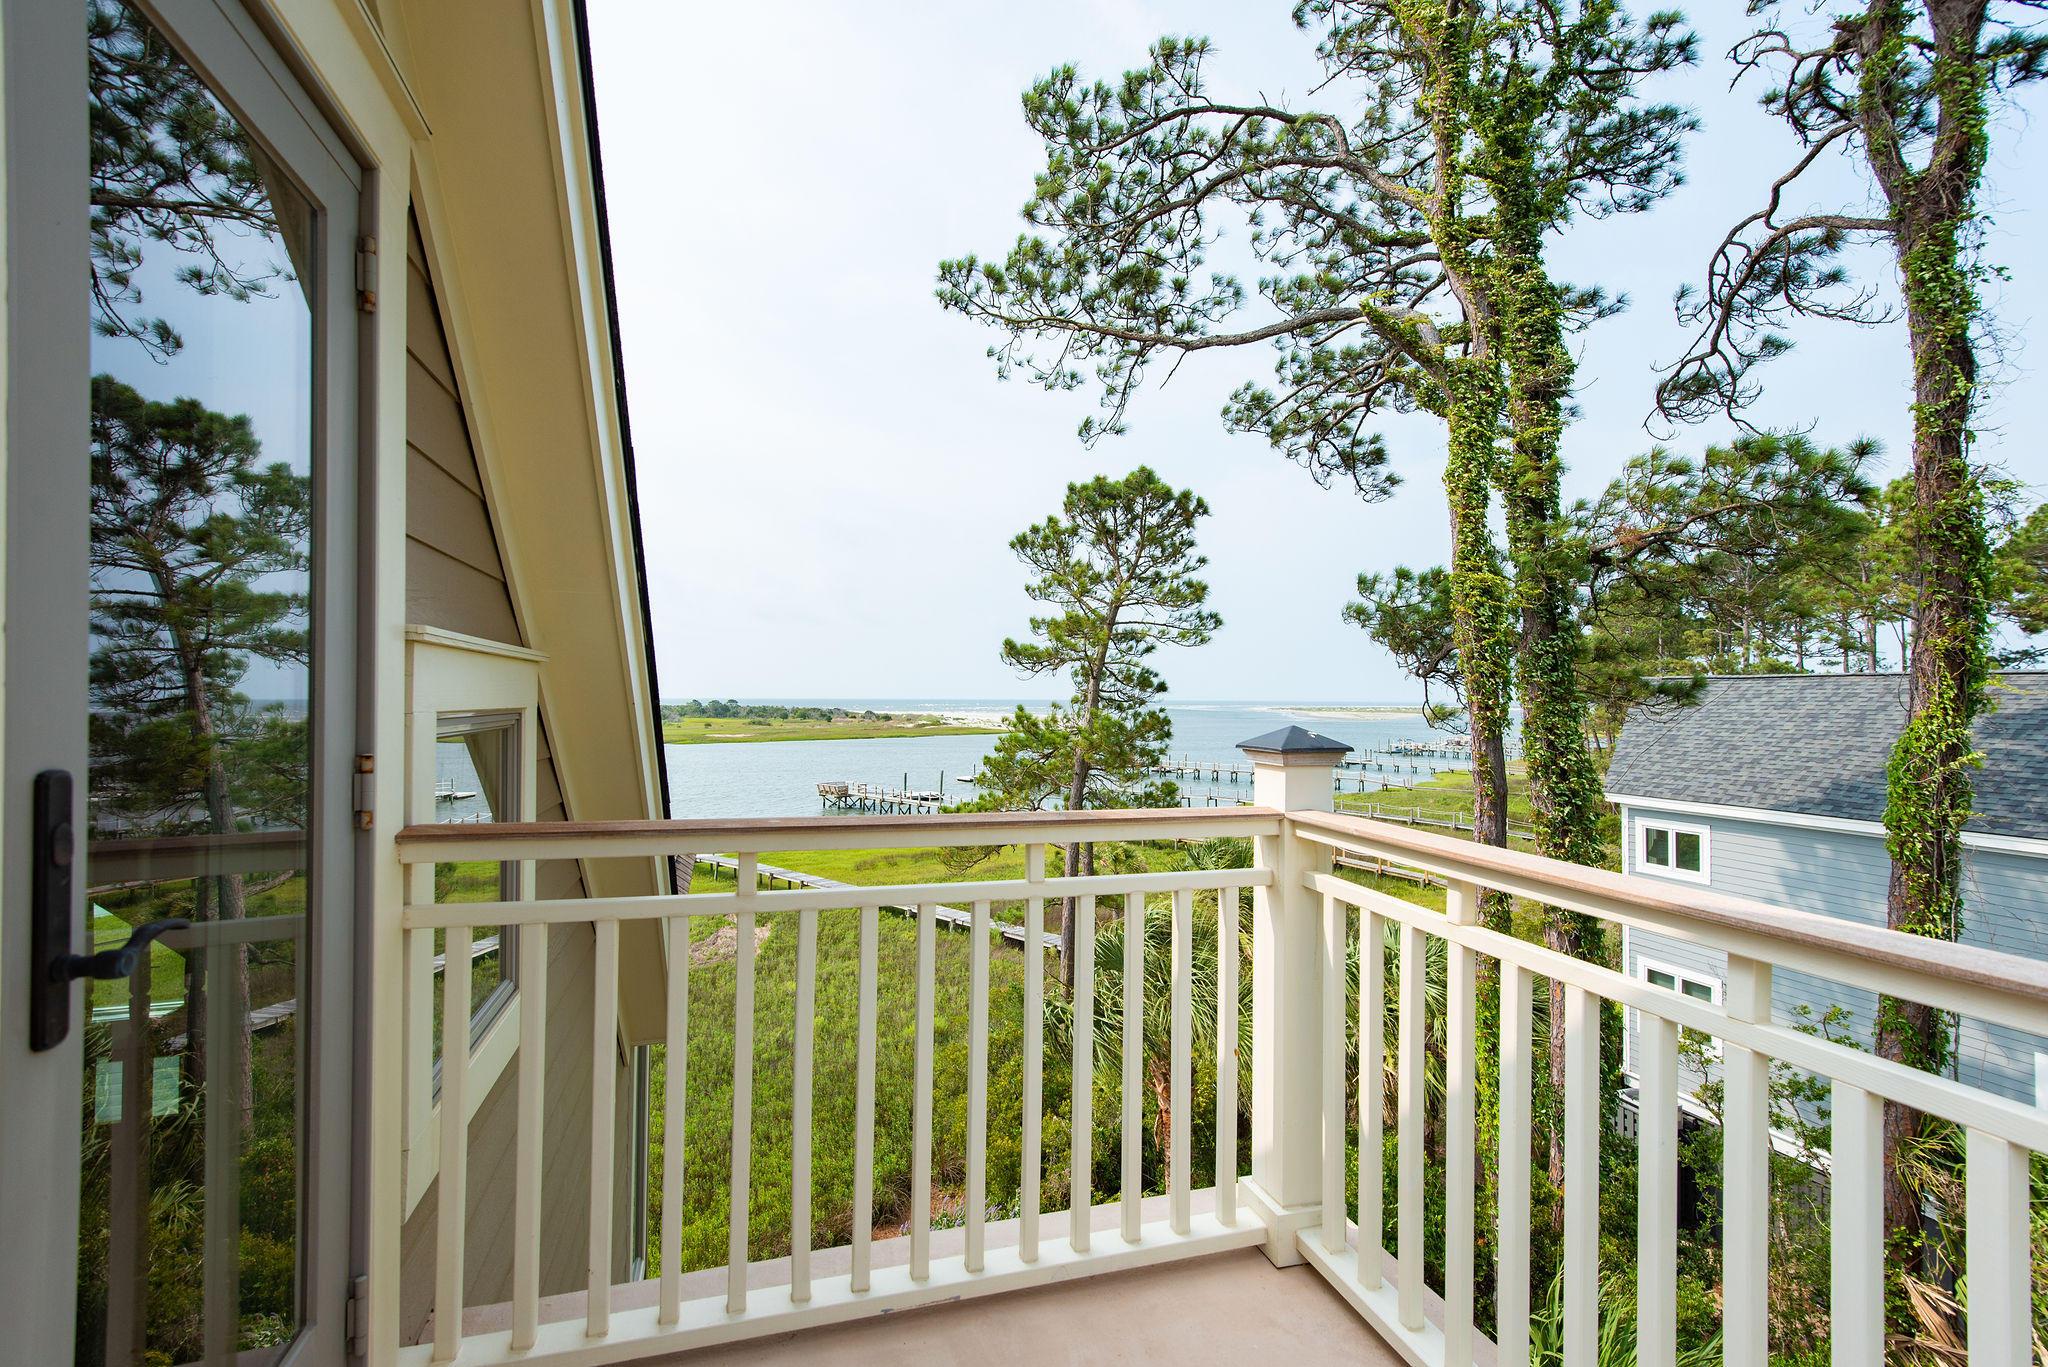 Seabrook Island Homes For Sale - 3135 Marshgate, Seabrook Island, SC - 34